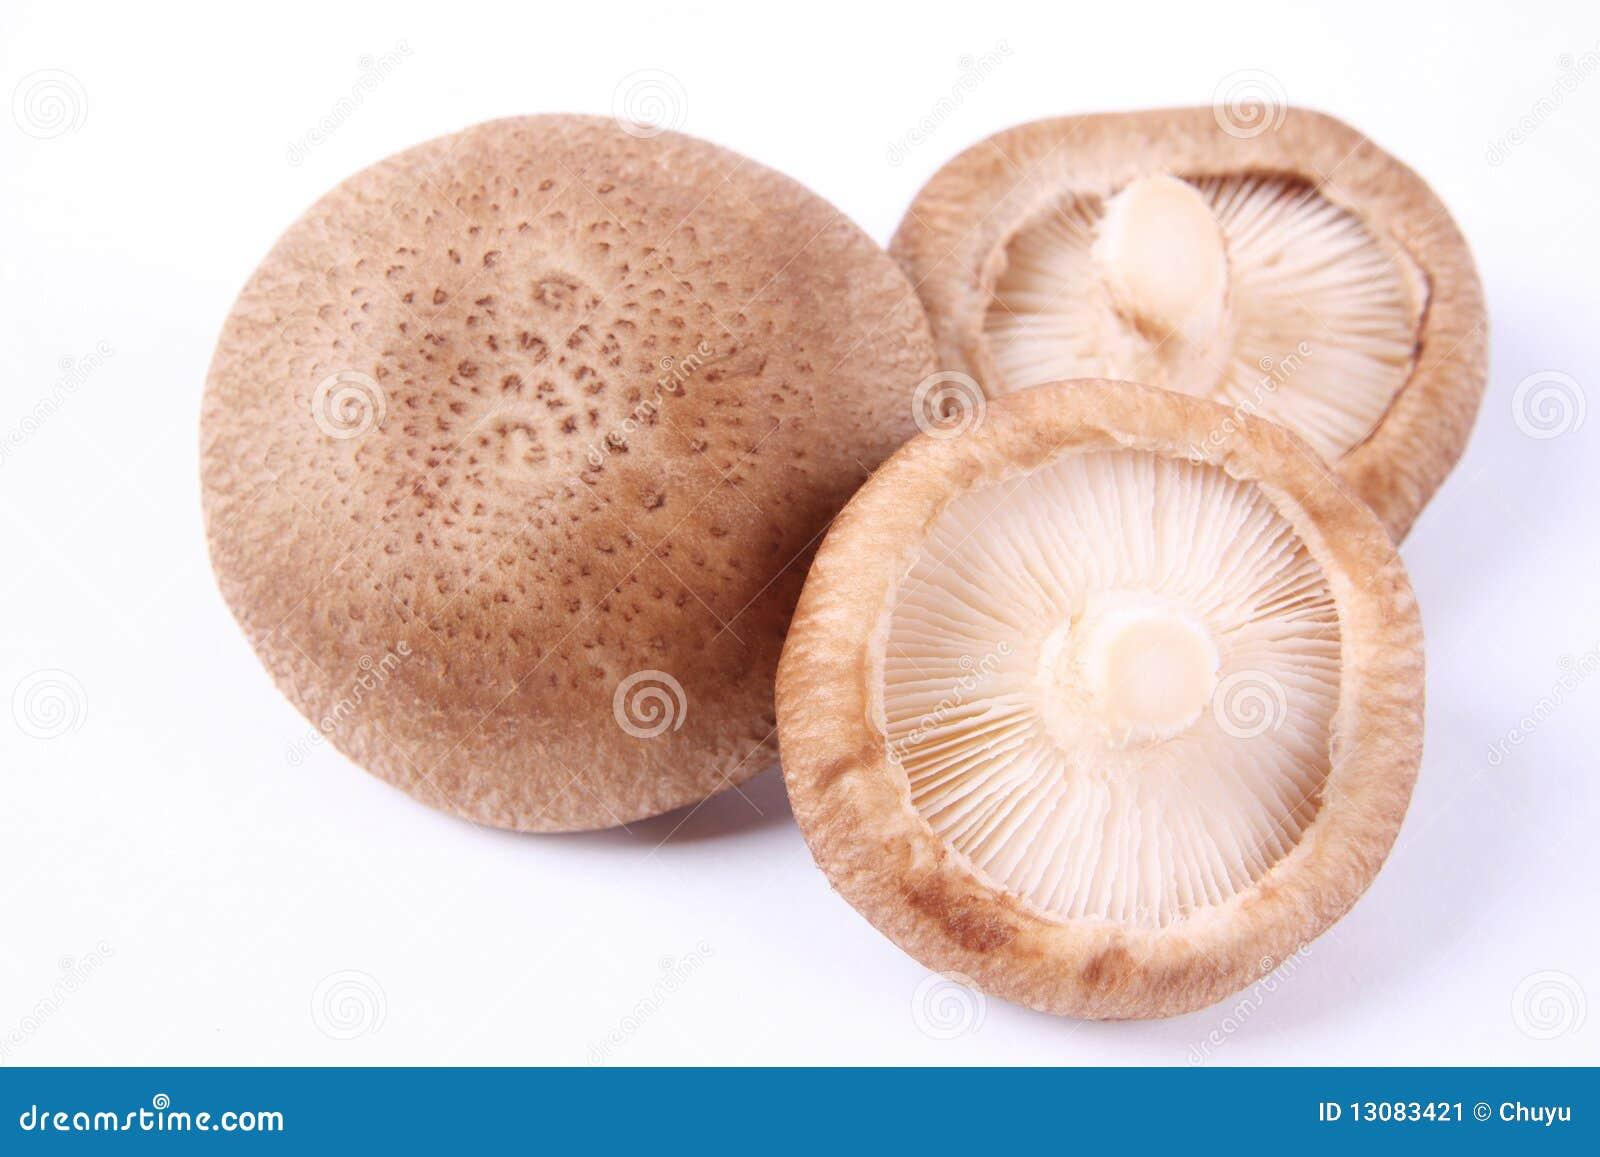 how to cook monkey head mushroom